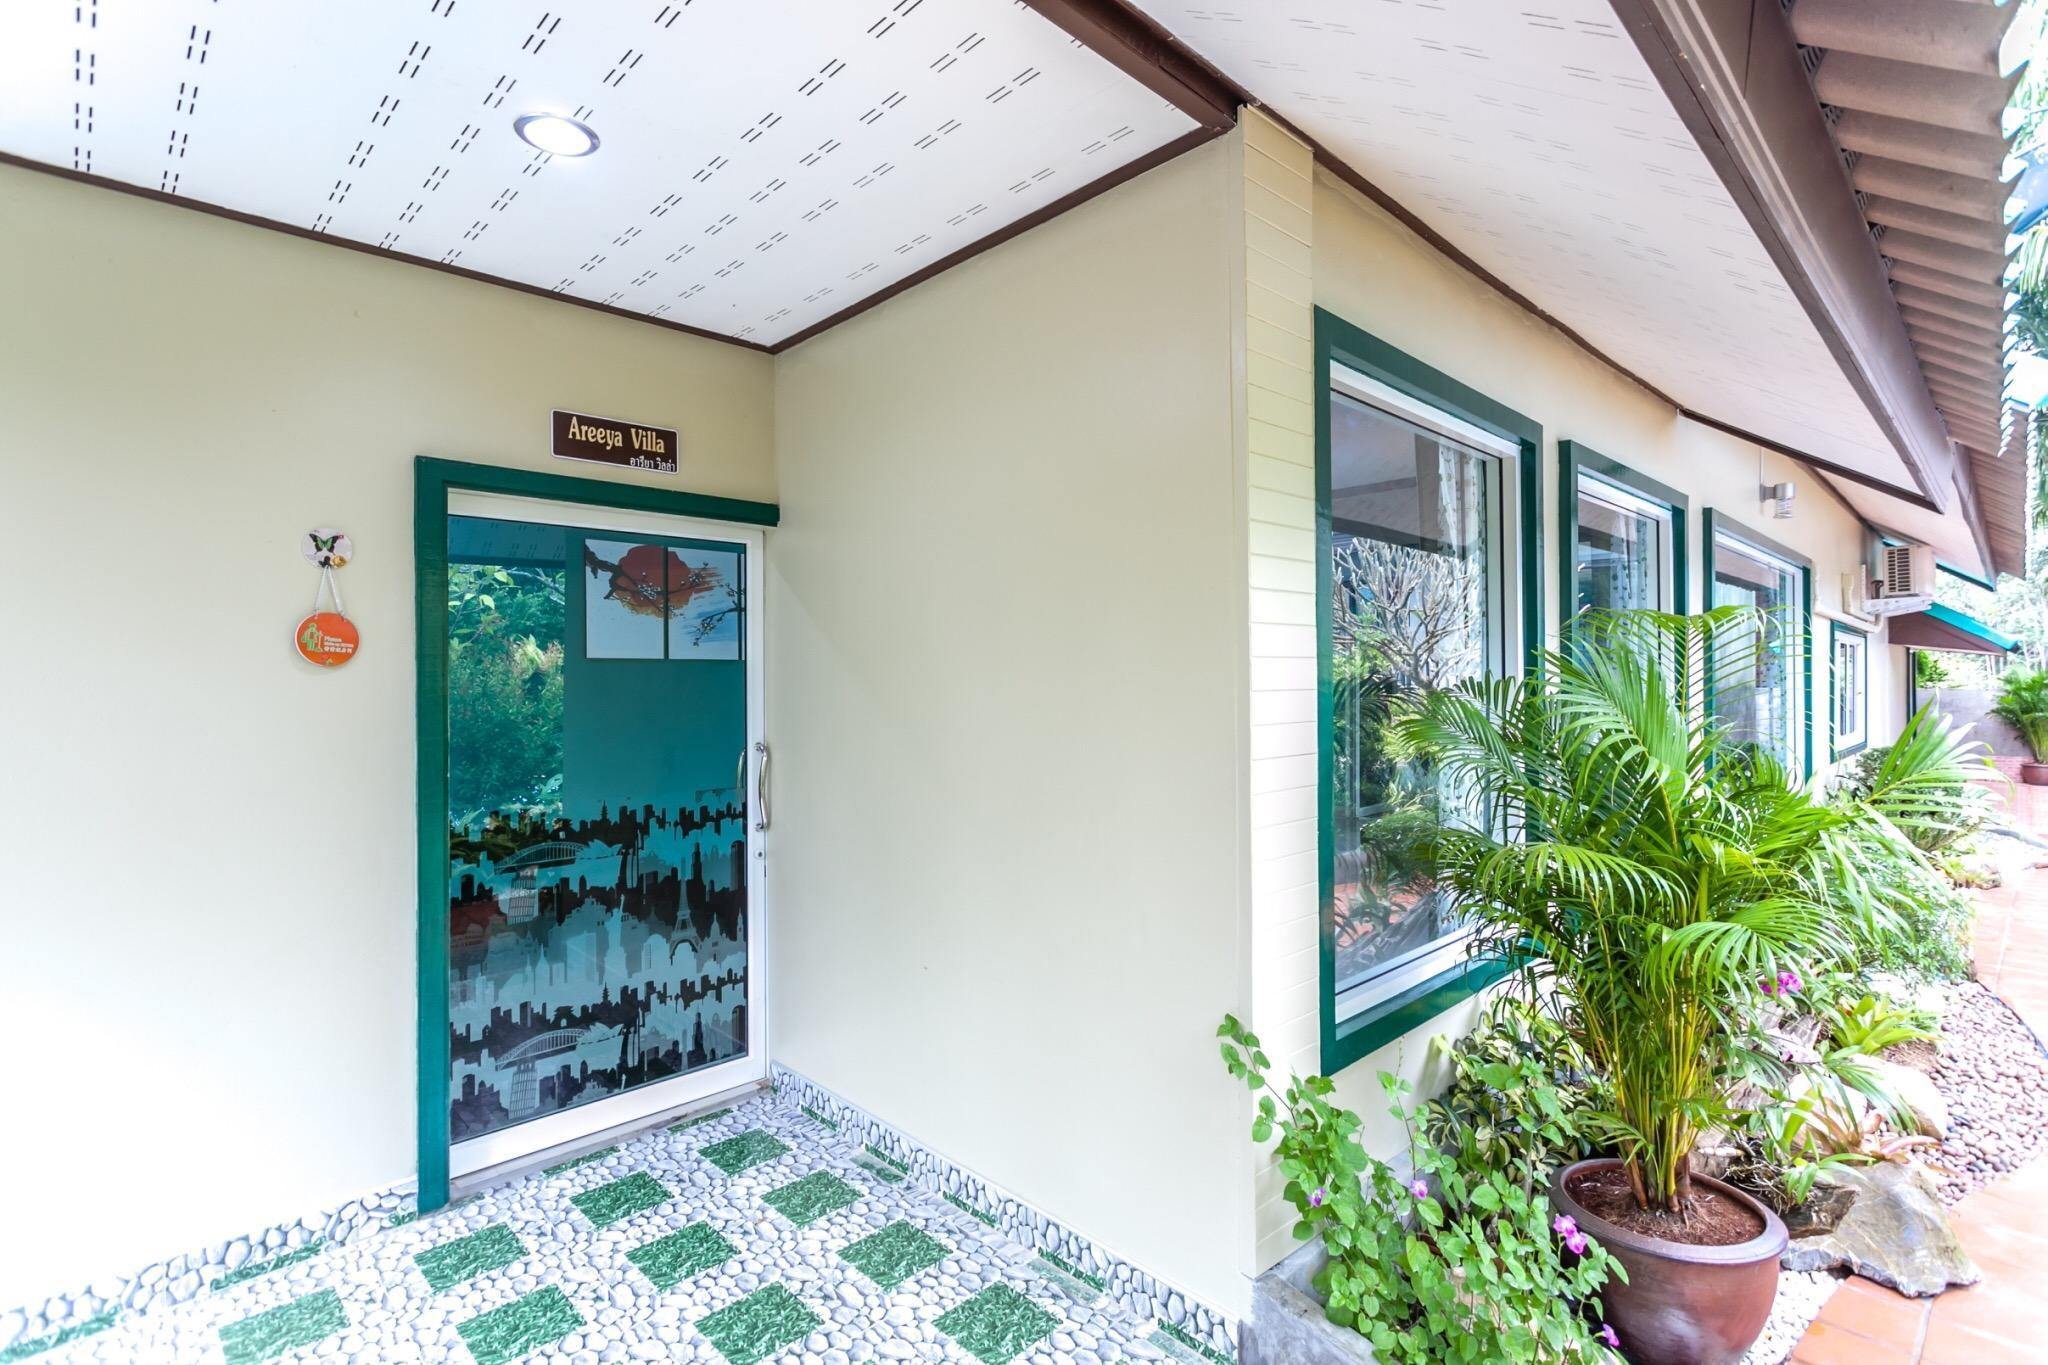 Areeya Phu Beach Resort  Areeya Villa